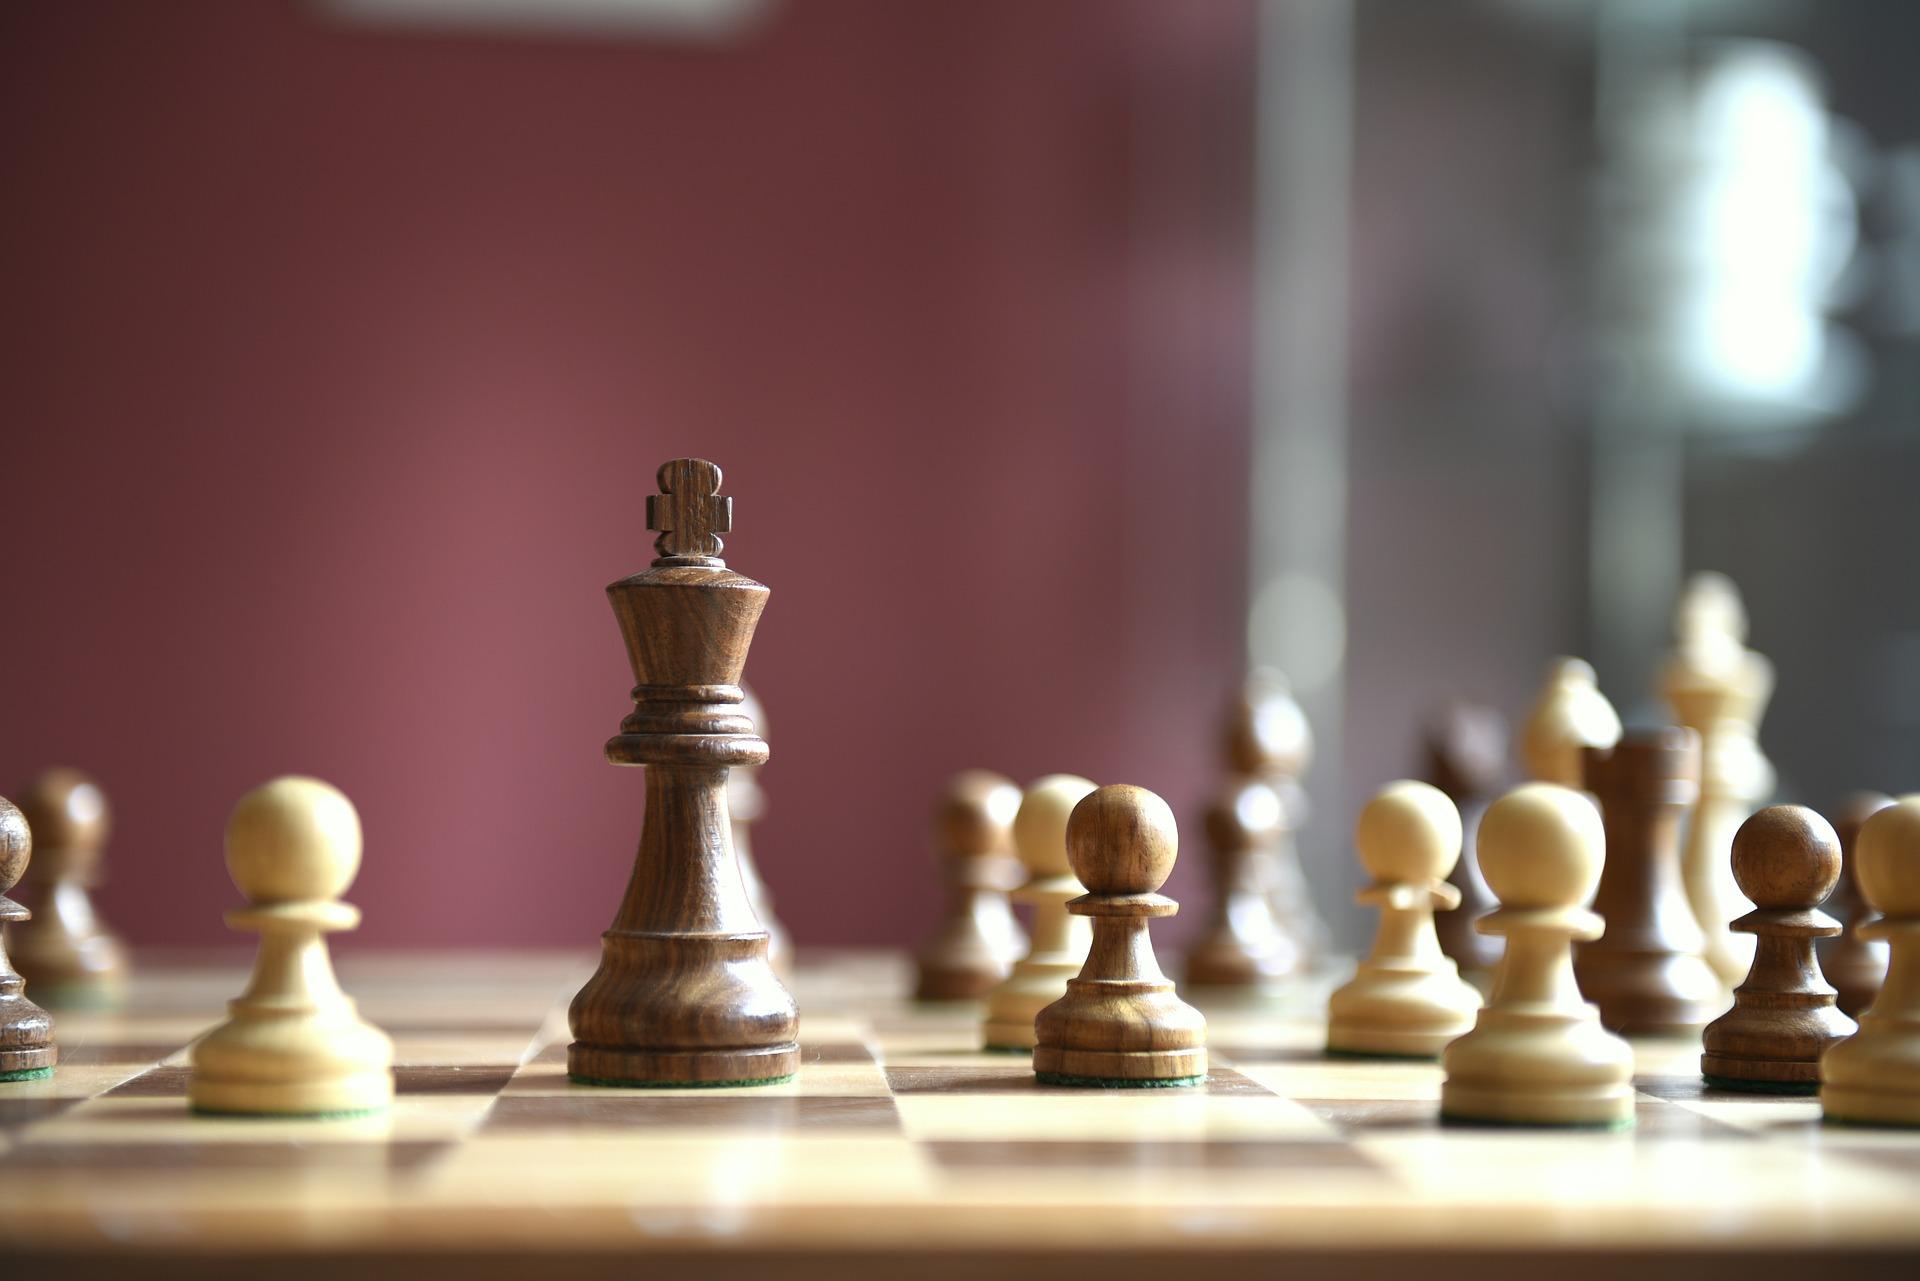 Онлайн-турнир по шахматам ко Дню знаний пройдет в Марушкинском